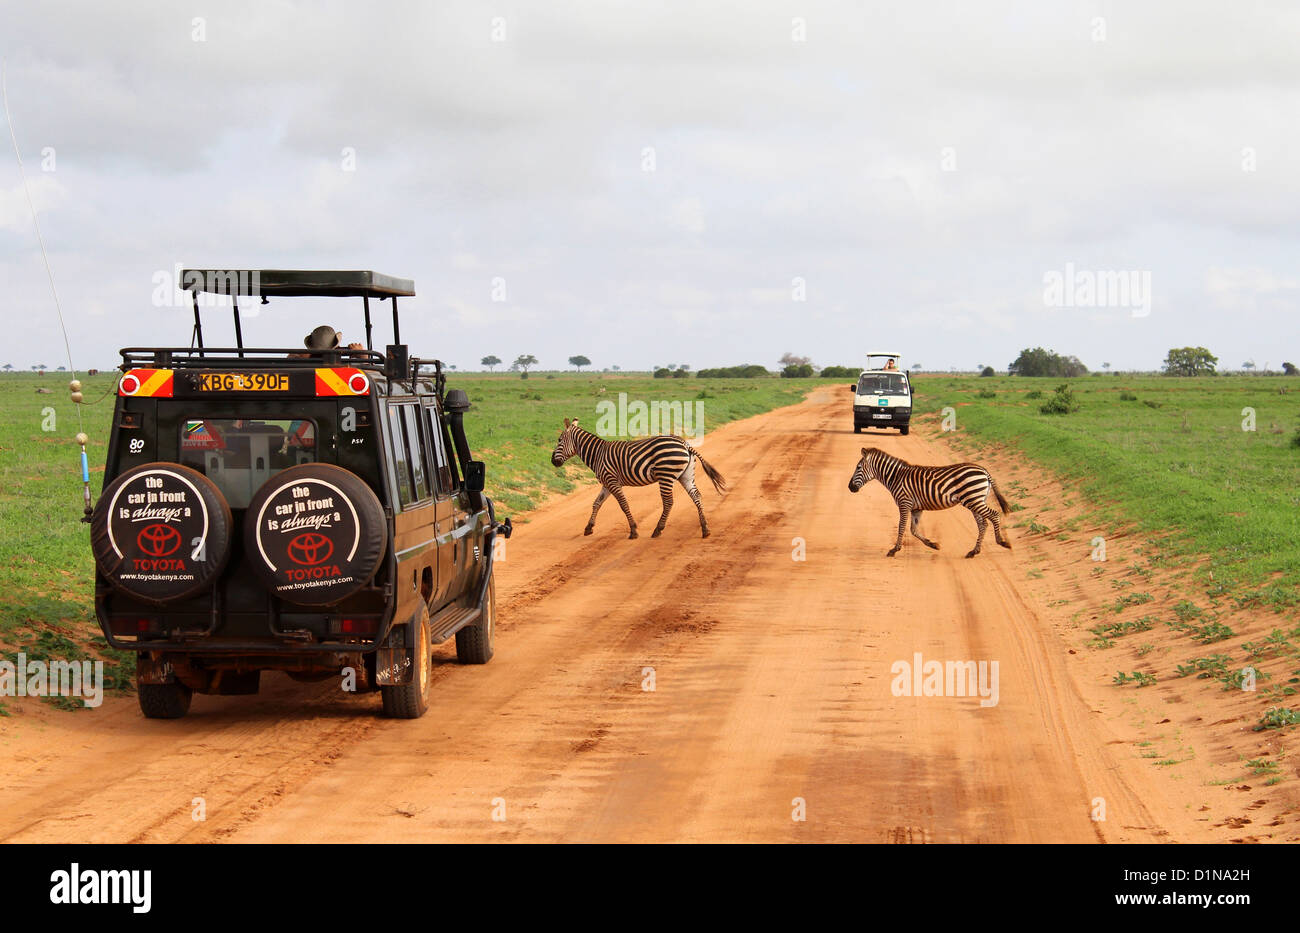 Zebras crossing on safari, Kenya, East Africa - Stock Image